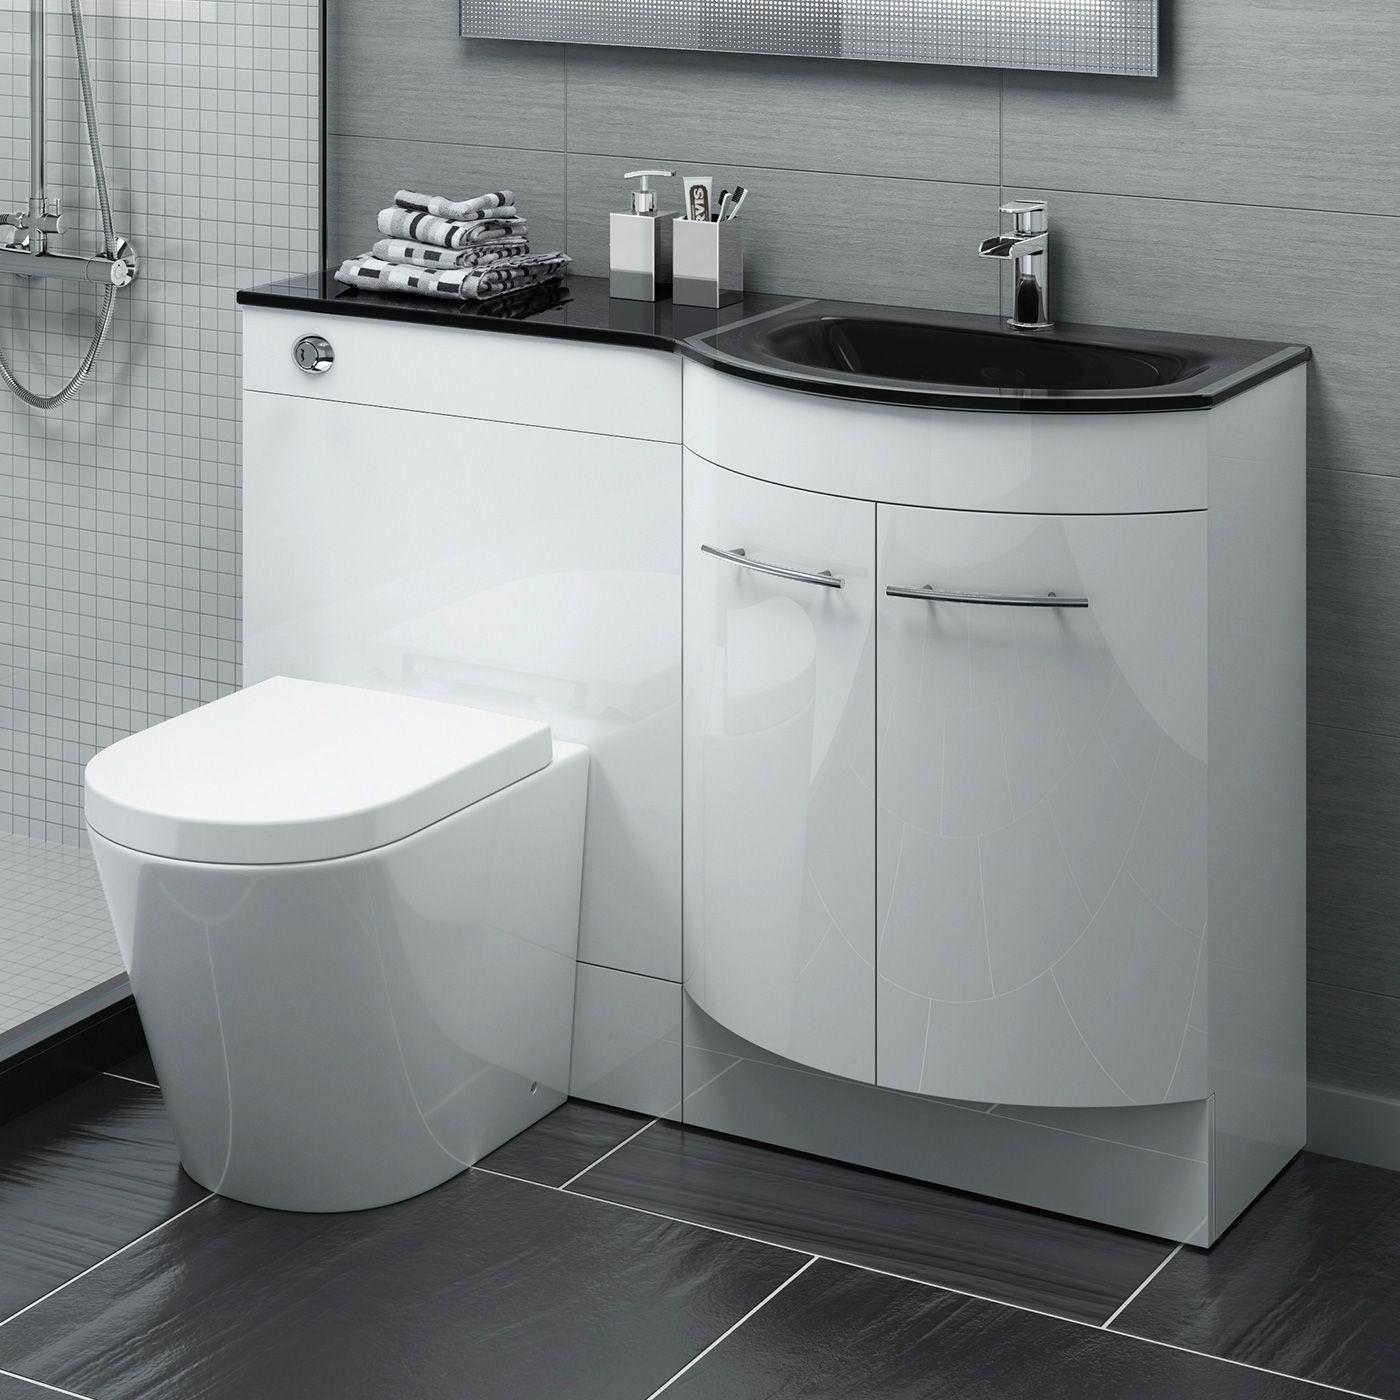 1200mm Alexis Gloss White Combined Vanity Unit Black Glass Basin Lyon Pan In 2019 Bathroom Vanity Units Fitted Bathroom Furniture Fitted Bathroom